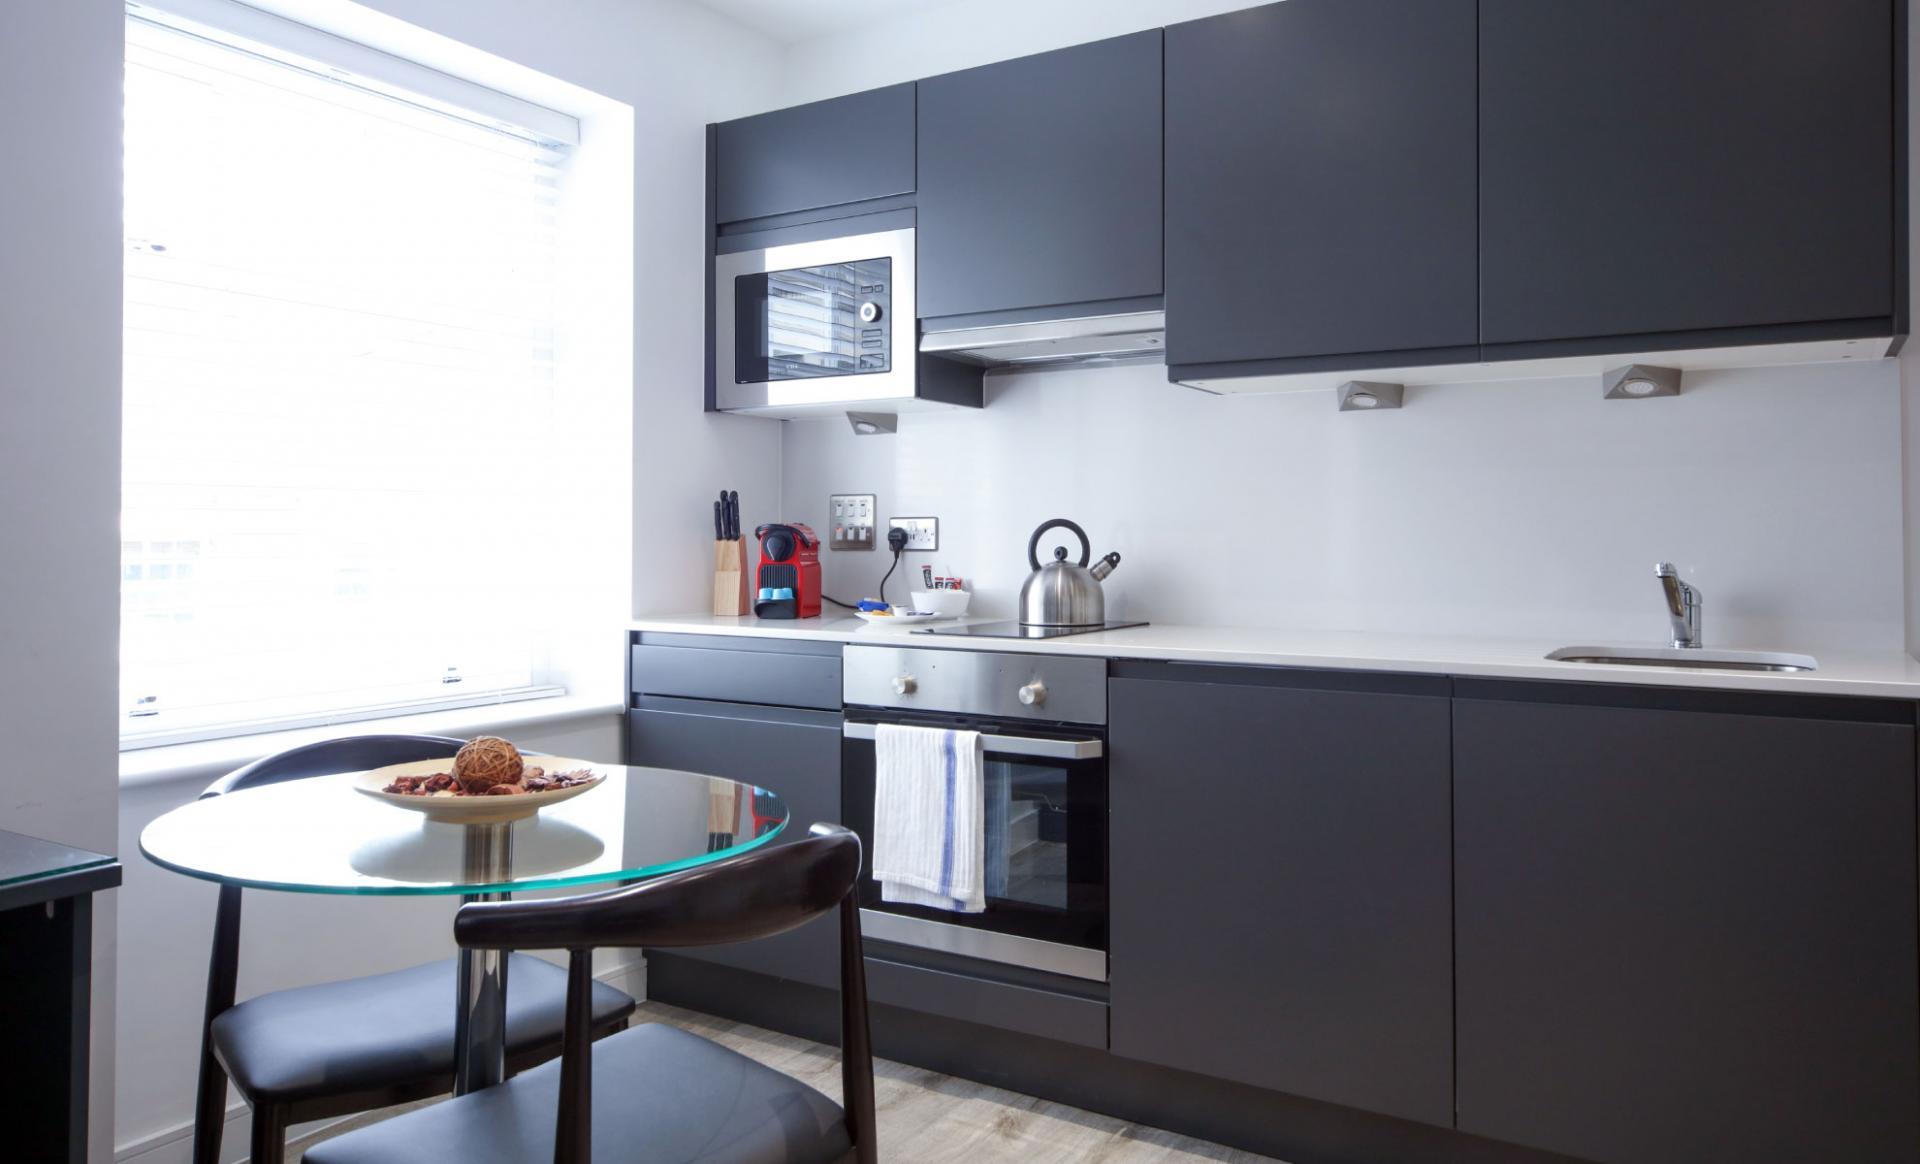 Kitchen at Citystop Apartments, Ropewalks, Liverpool - Citybase Apartments